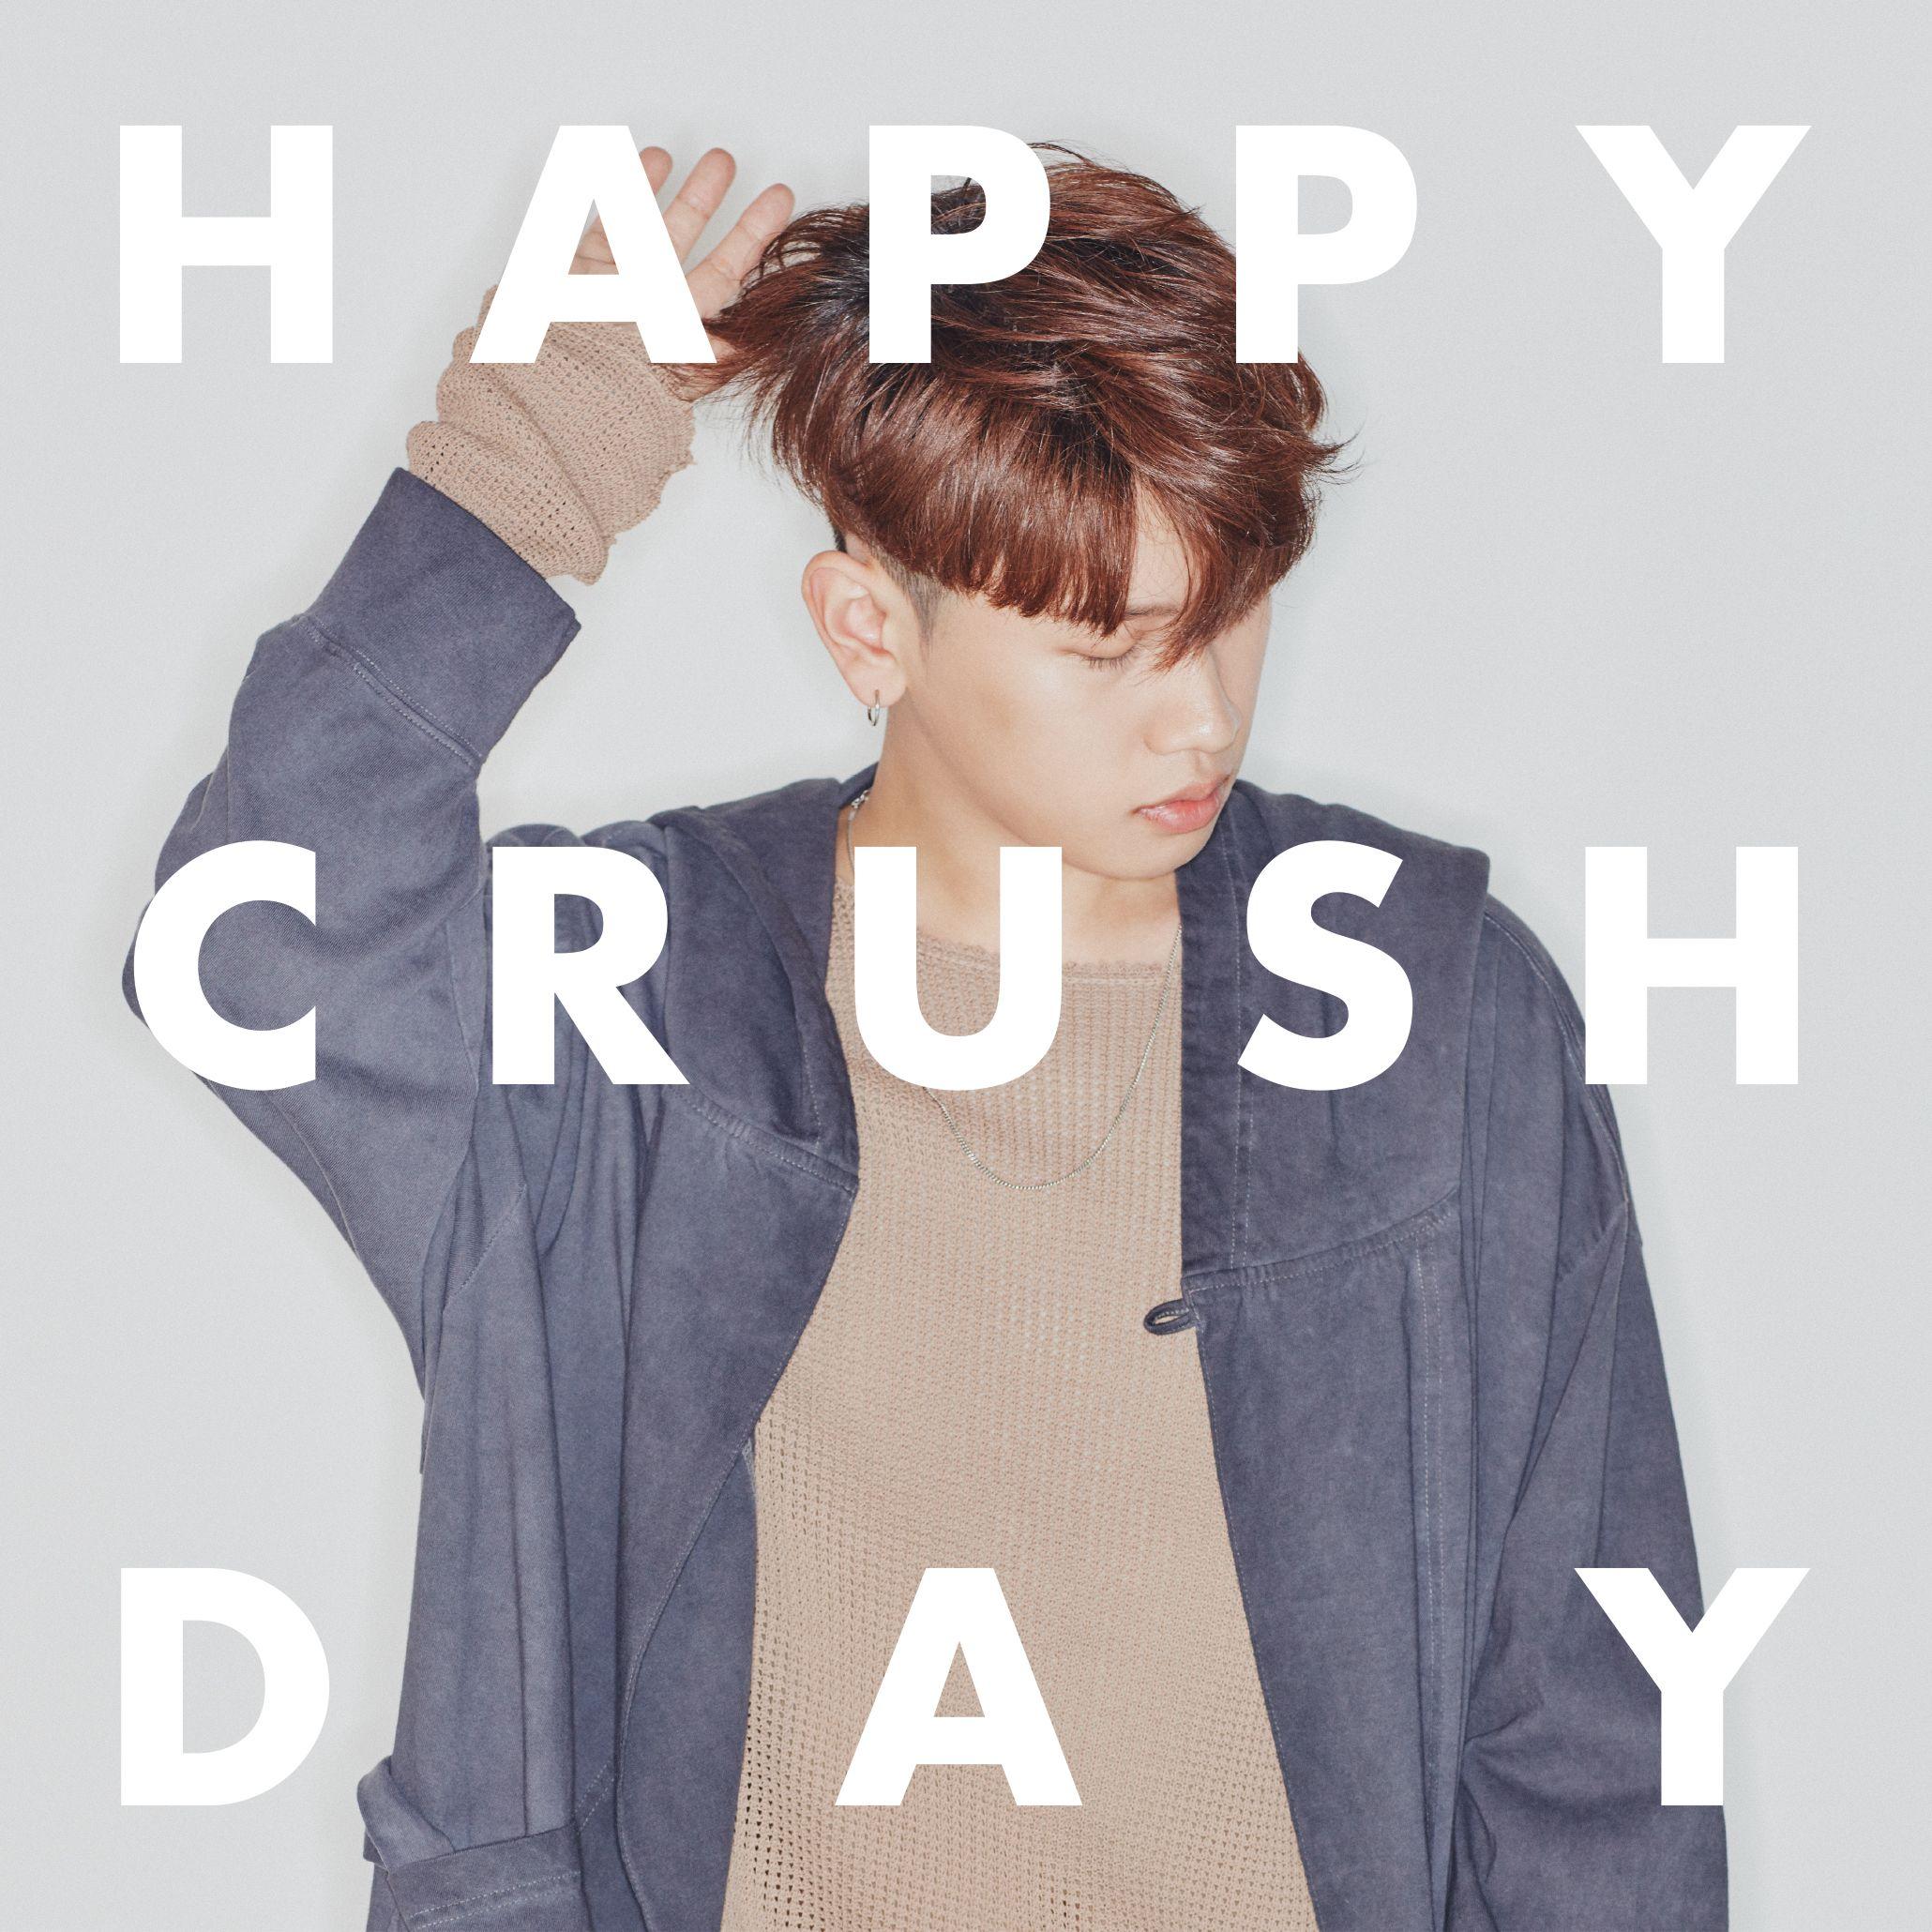 Crush's 25th Birthday! Congratulations!  #Crush #크러쉬 #HappyCrushDay #HBD #HappyBirthday #크러쉬생일